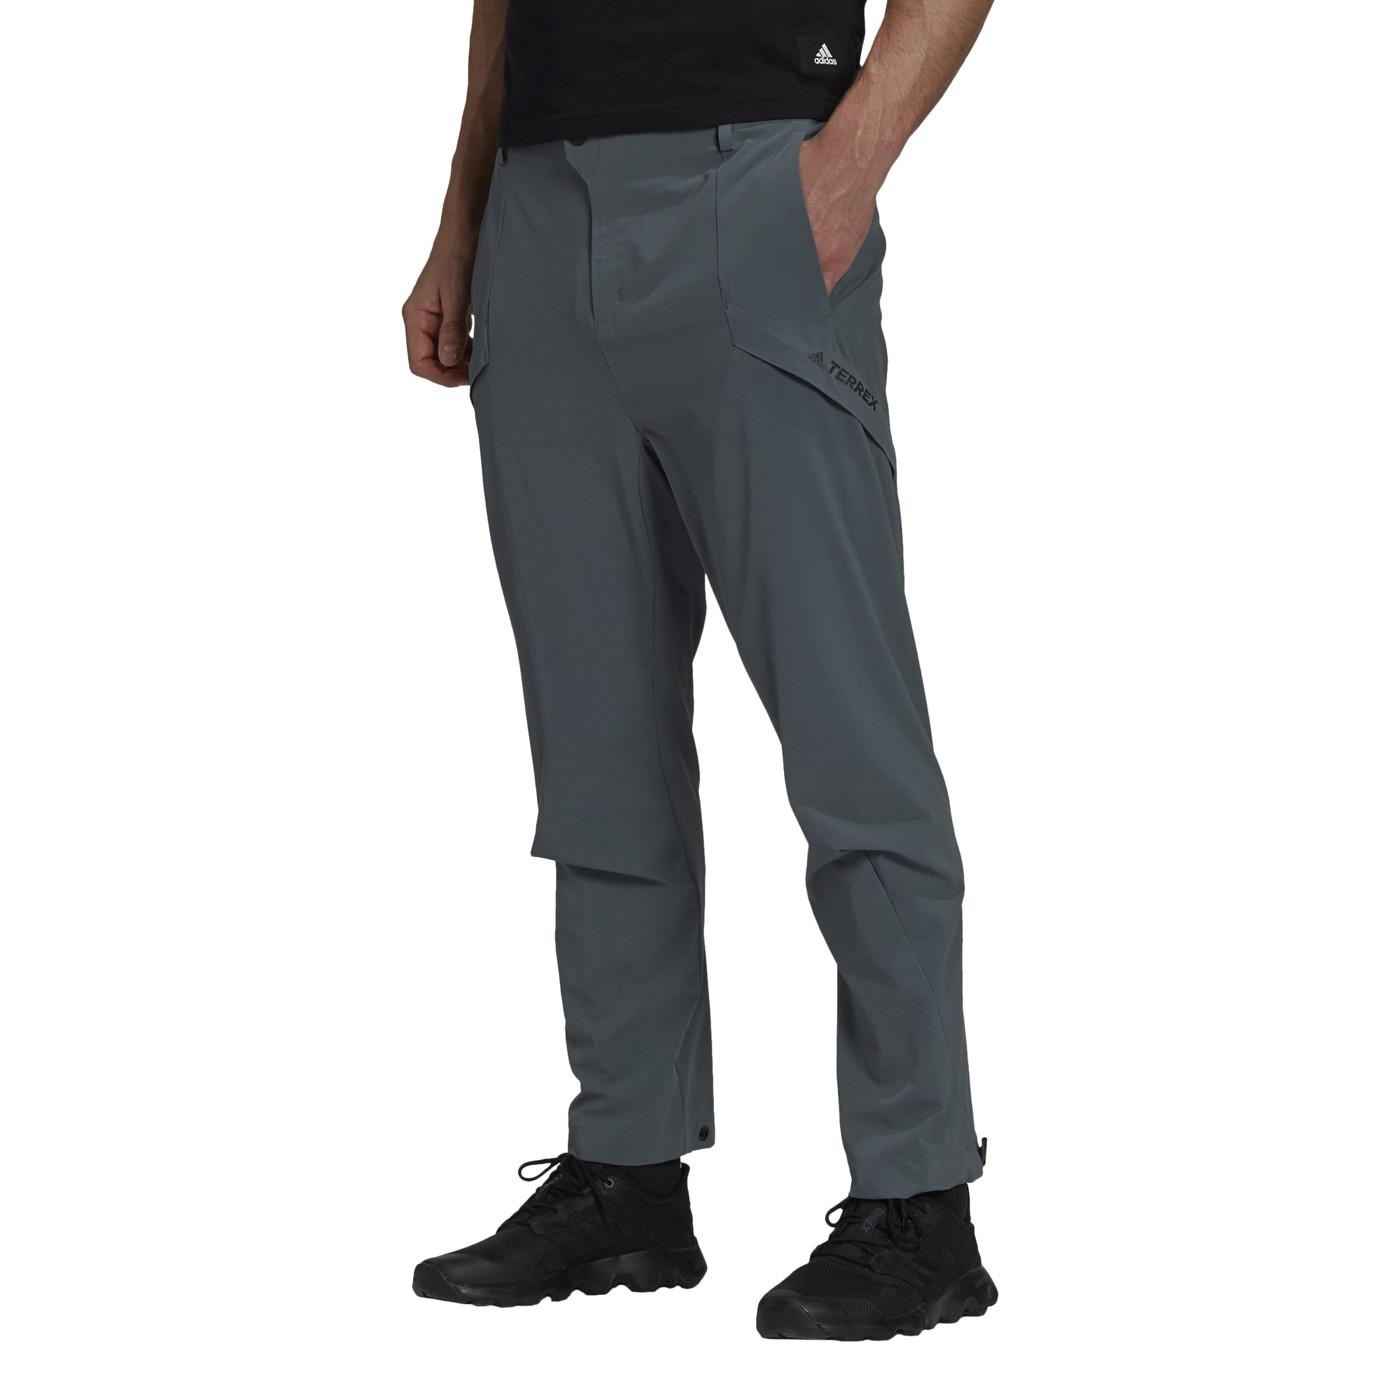 ADIDAS Hike Pants - Herren